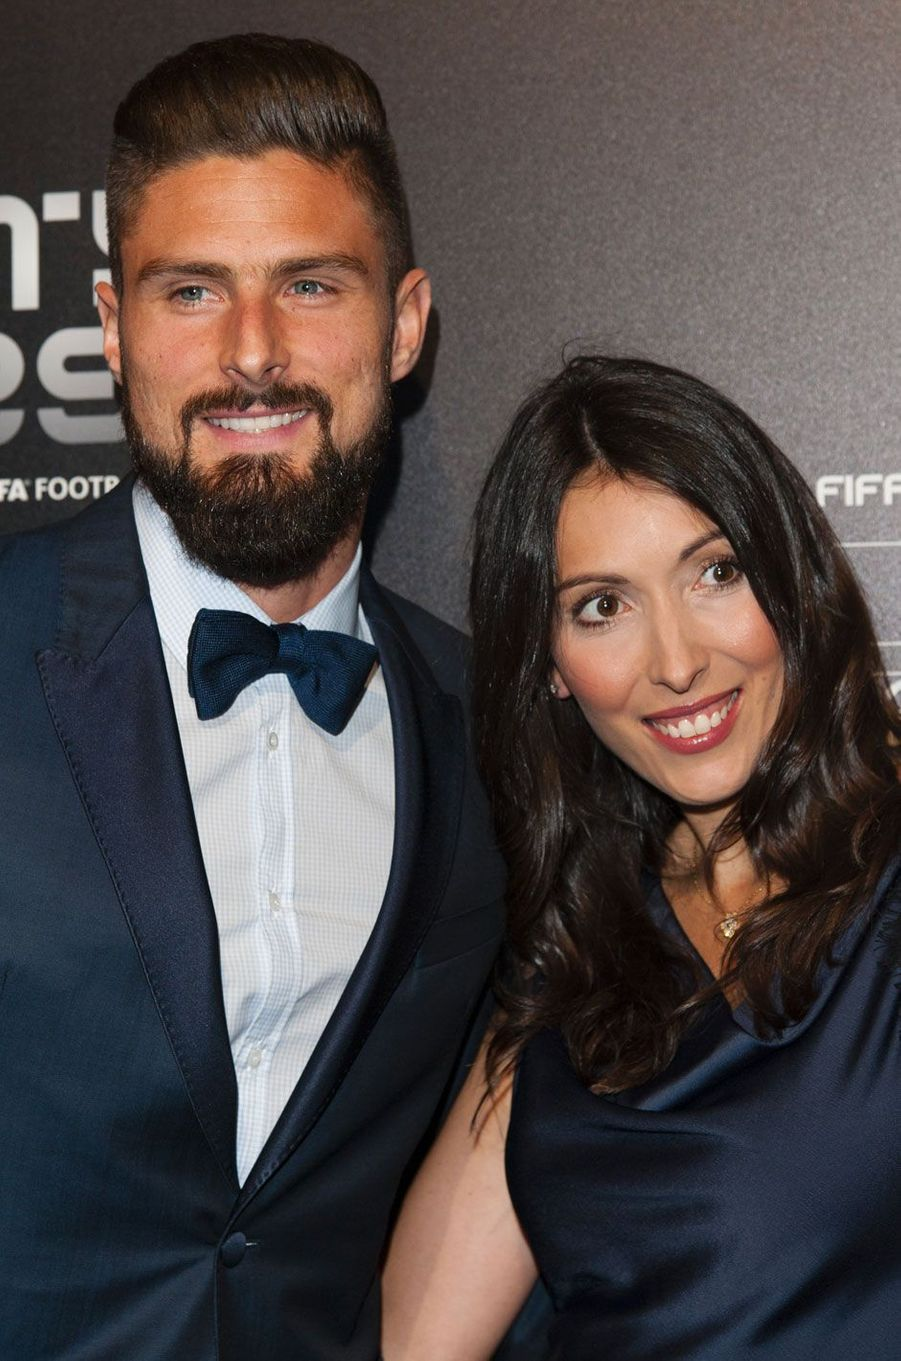 Olivier et Jennifer Giroud au Football Awards 2017 à Londres, le 23 octobre 2017